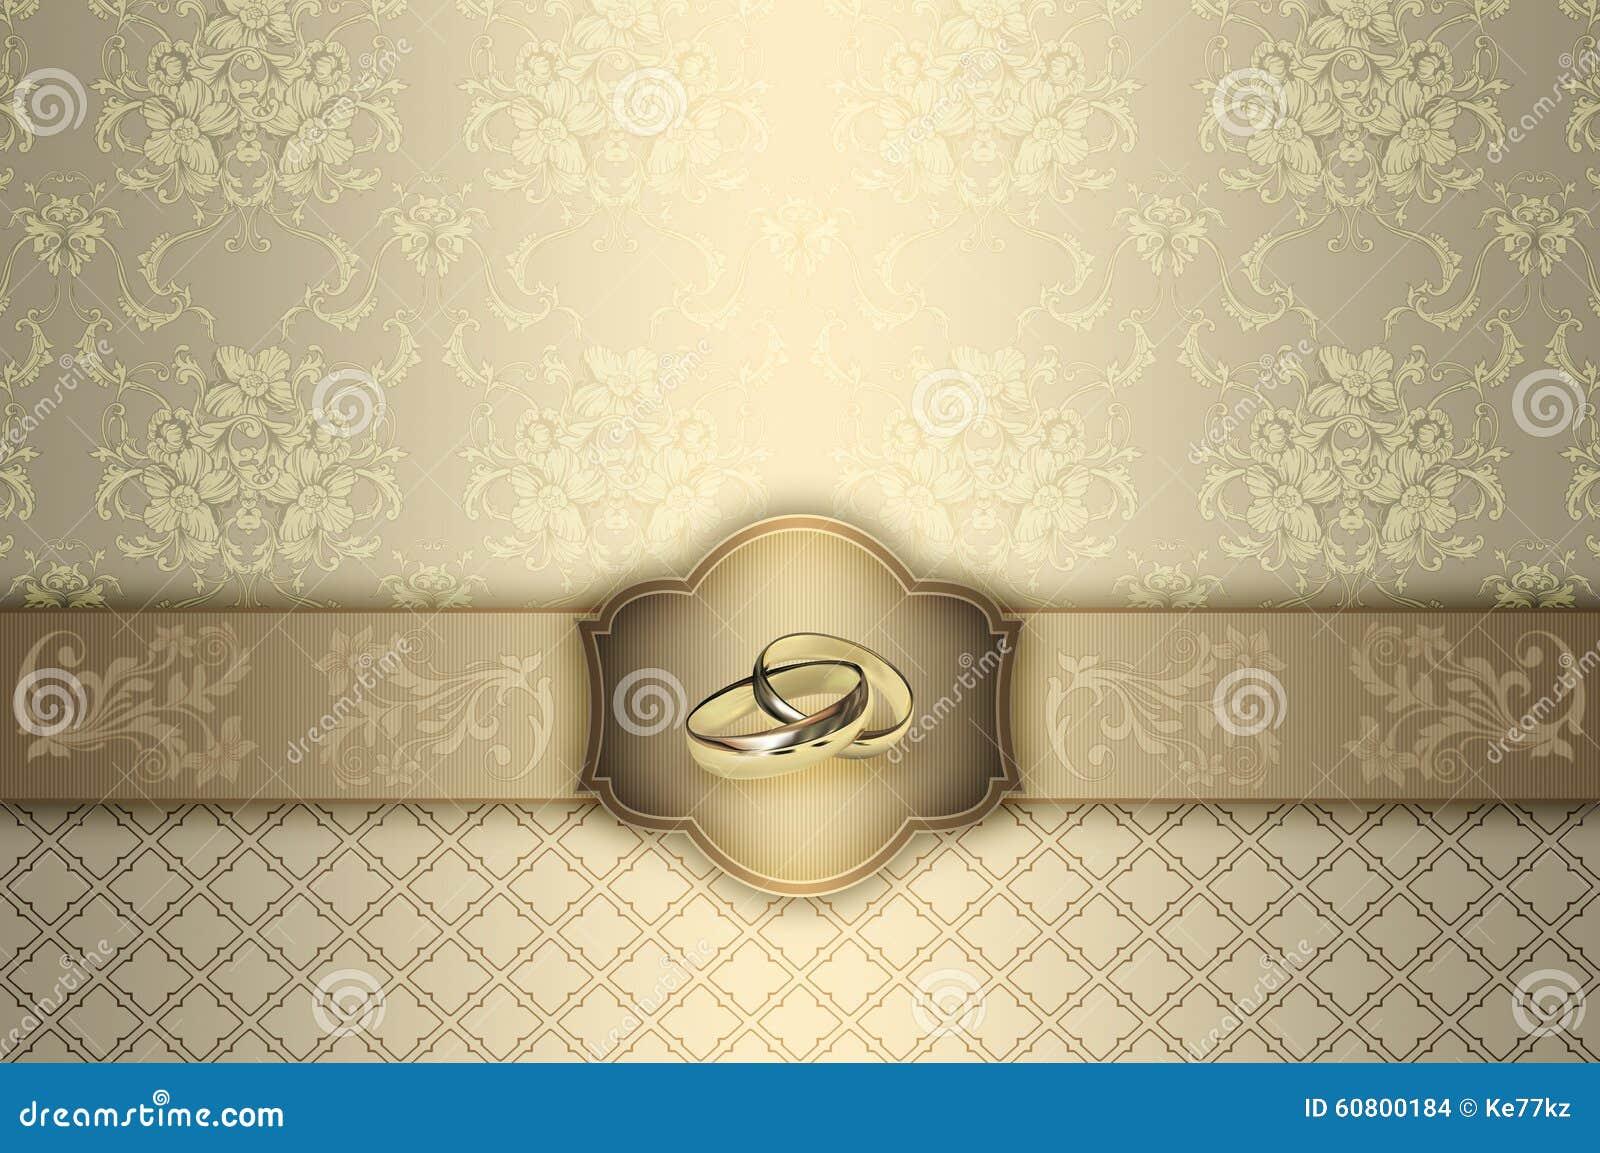 Wedding Invitation Card Design. Stock Illustration ...